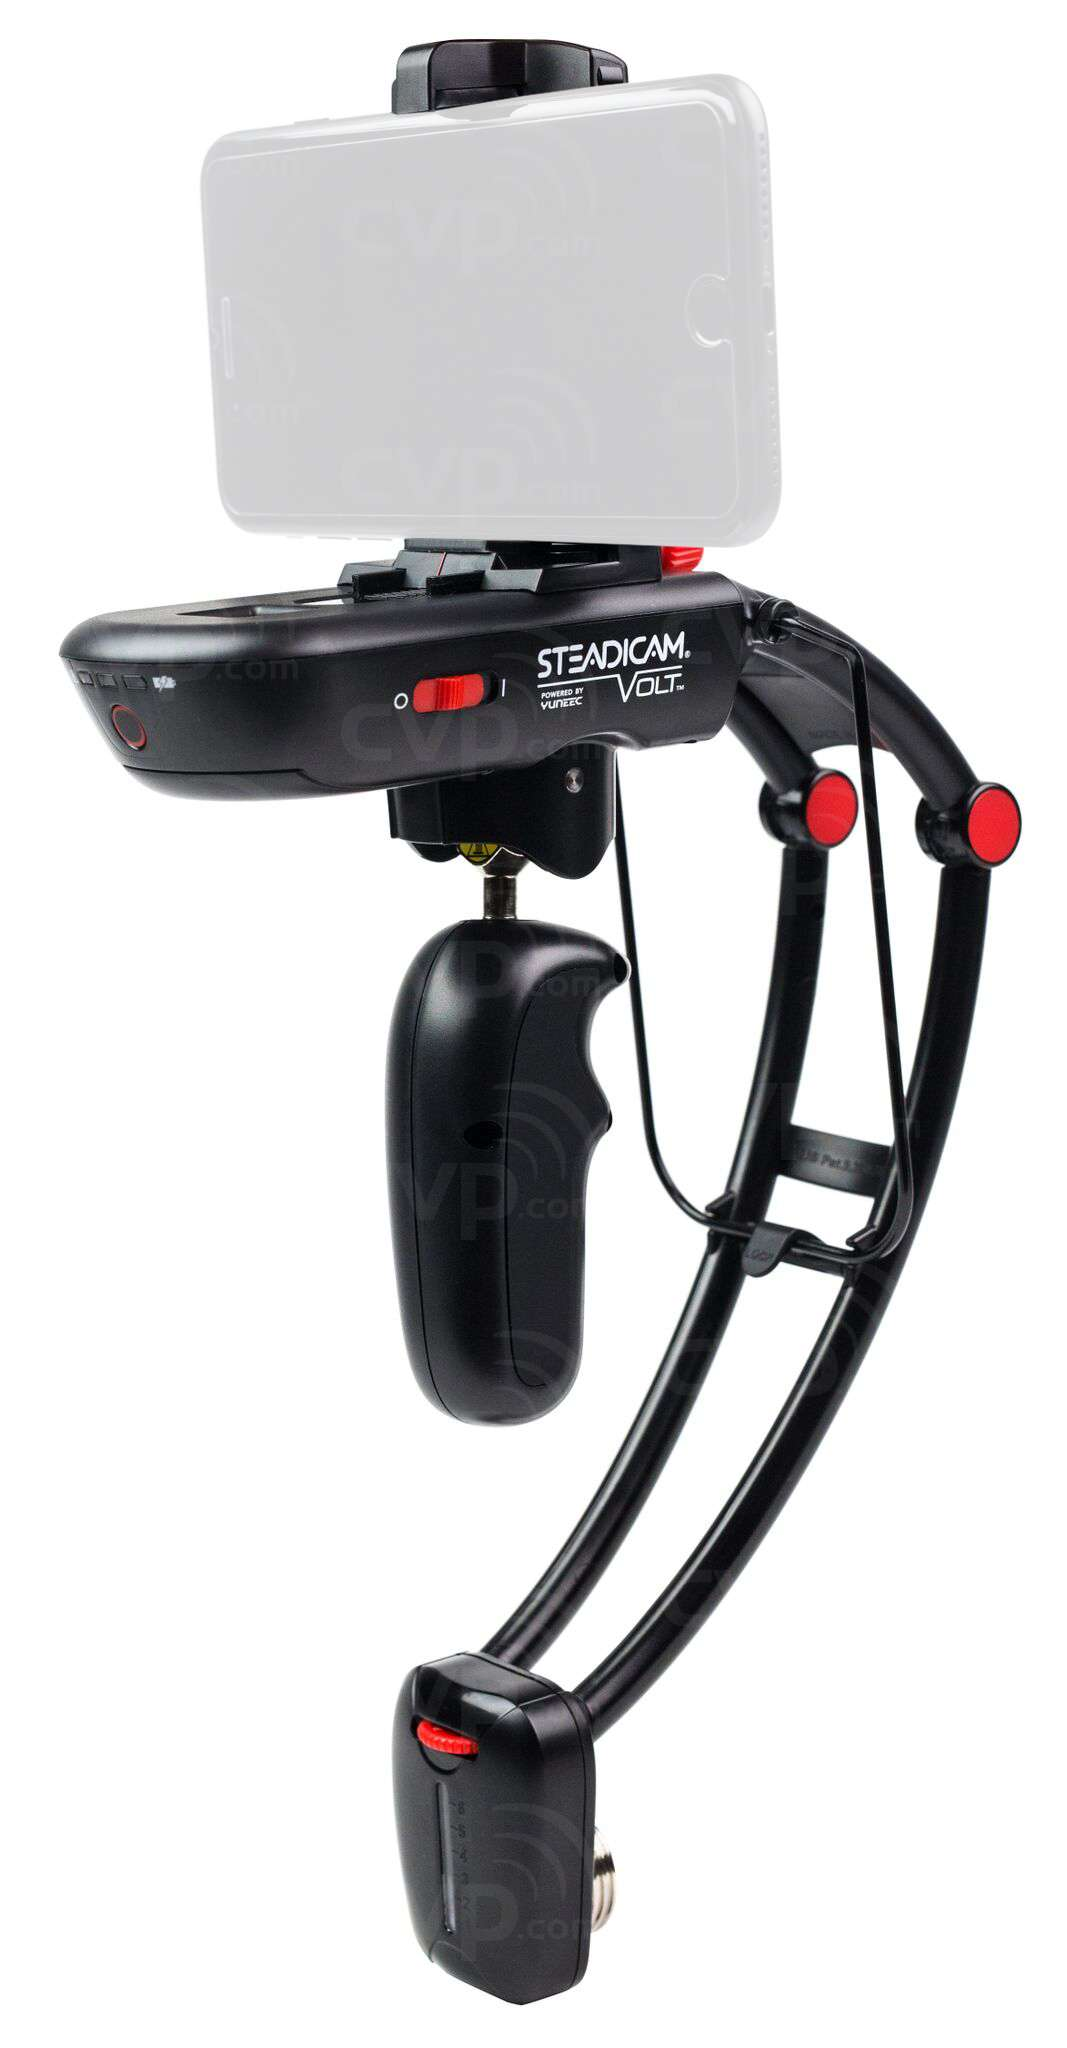 Steadicam Volt Handheld Motorised Gimbal Gyroscopic Smartphone Stabiliser (SDV-VOLT)